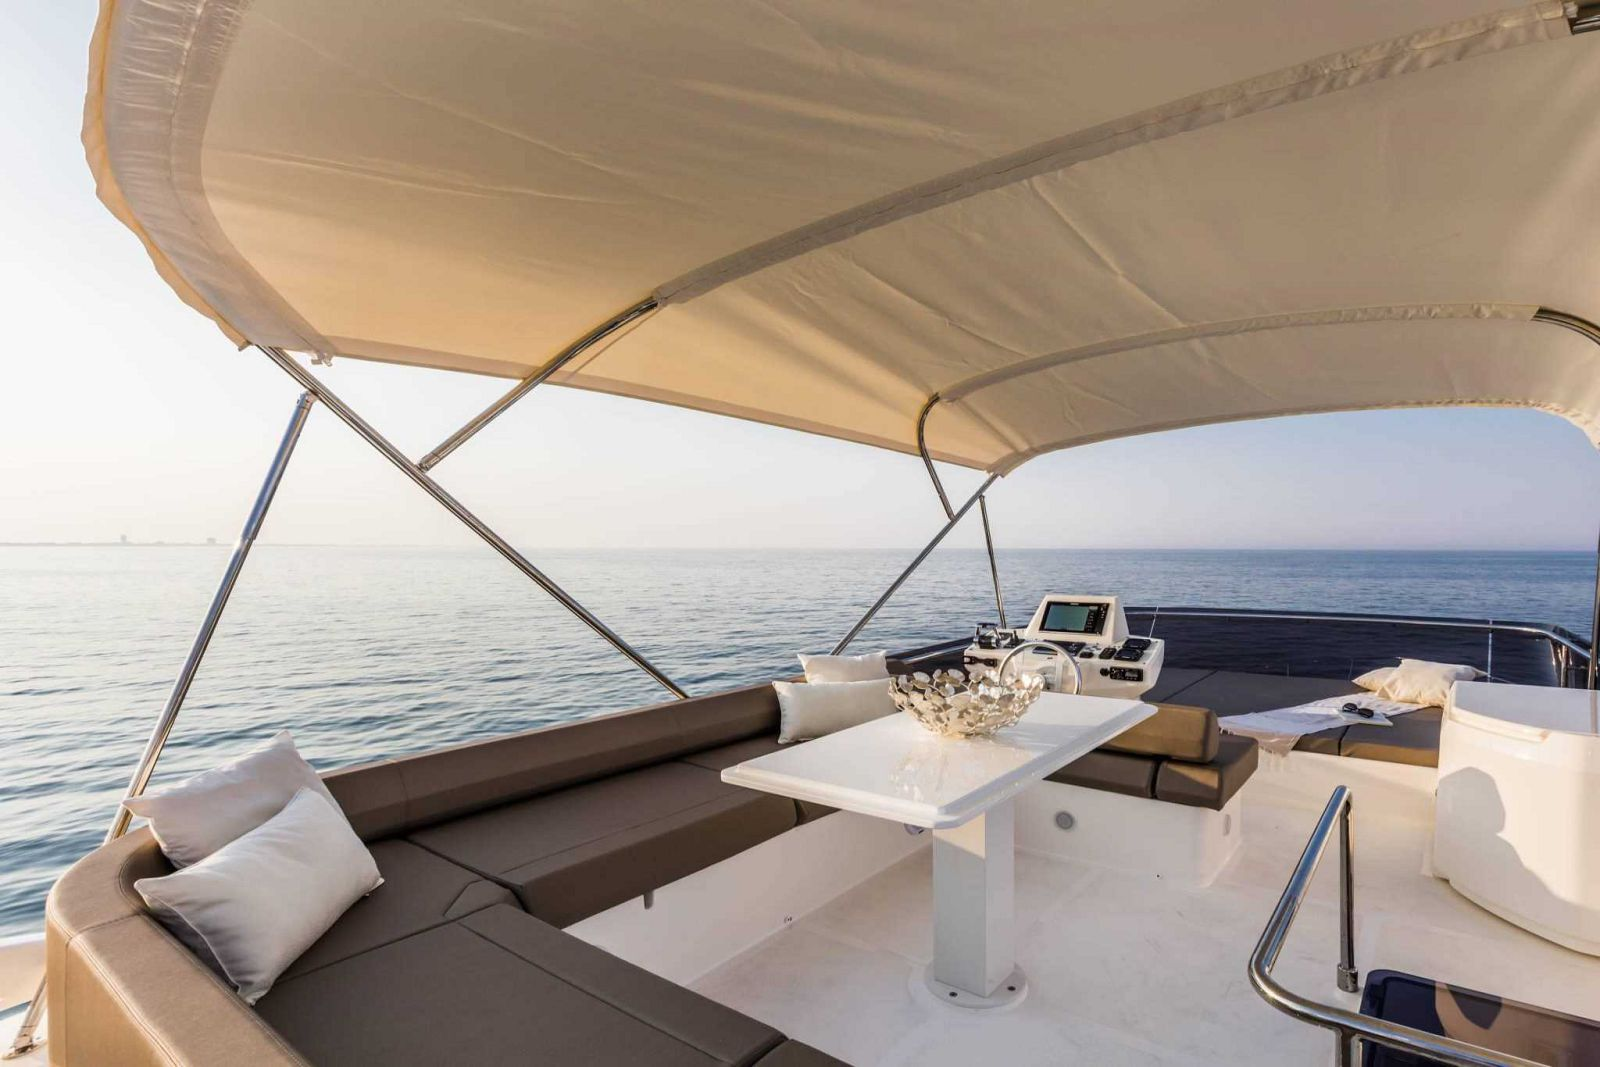 Ferretti Yachts 550 Flybridge - New Luxury Yacht for Sale >